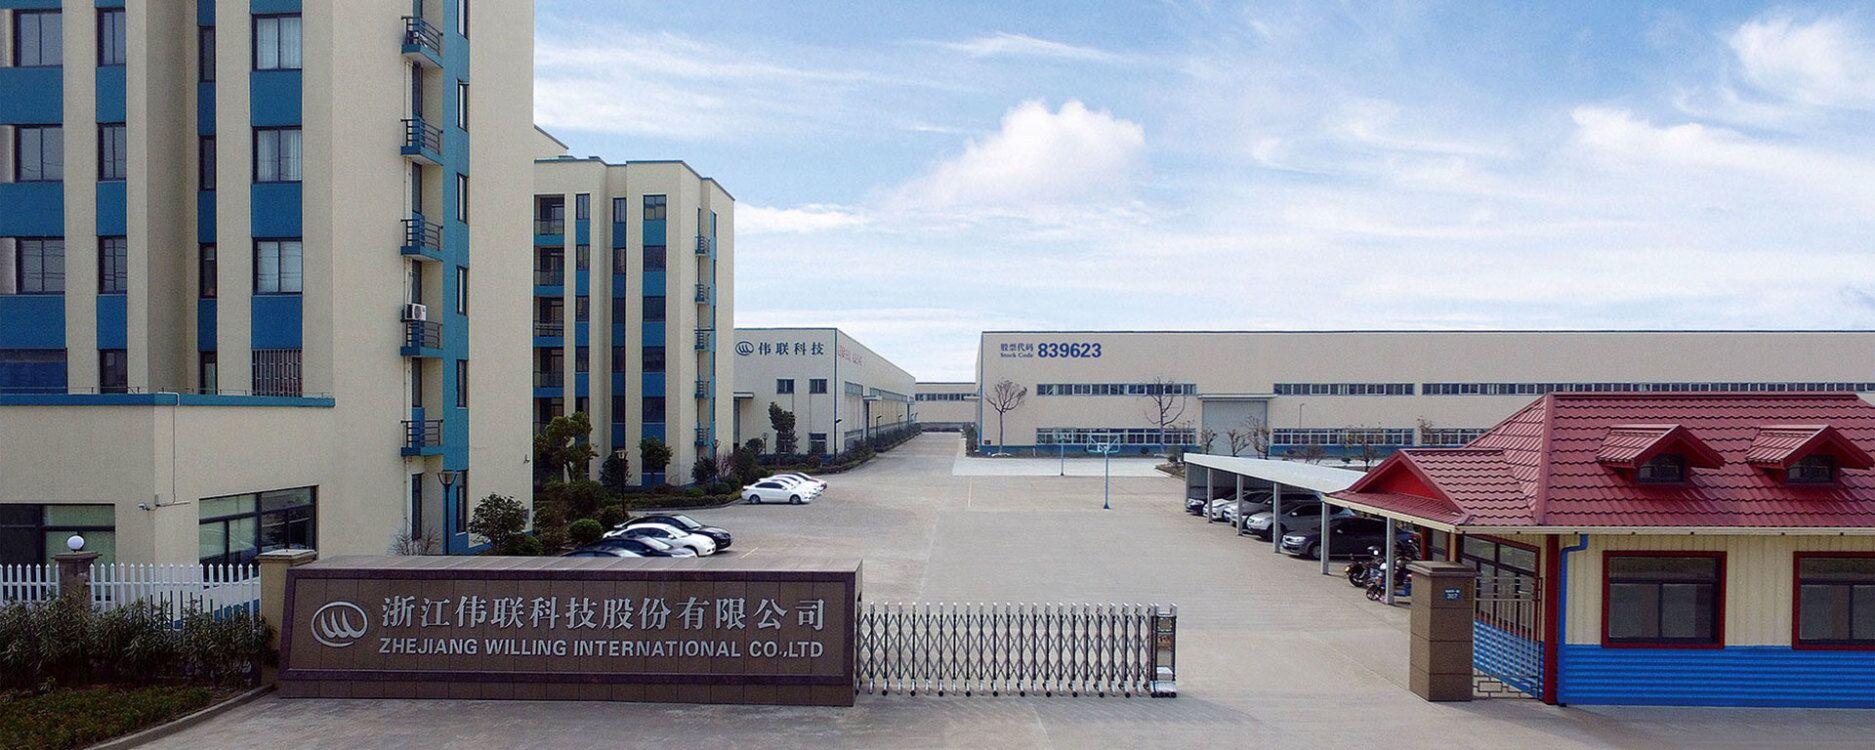 HANGZHOU WILLING INTERNATIONAL CO.,LTD.